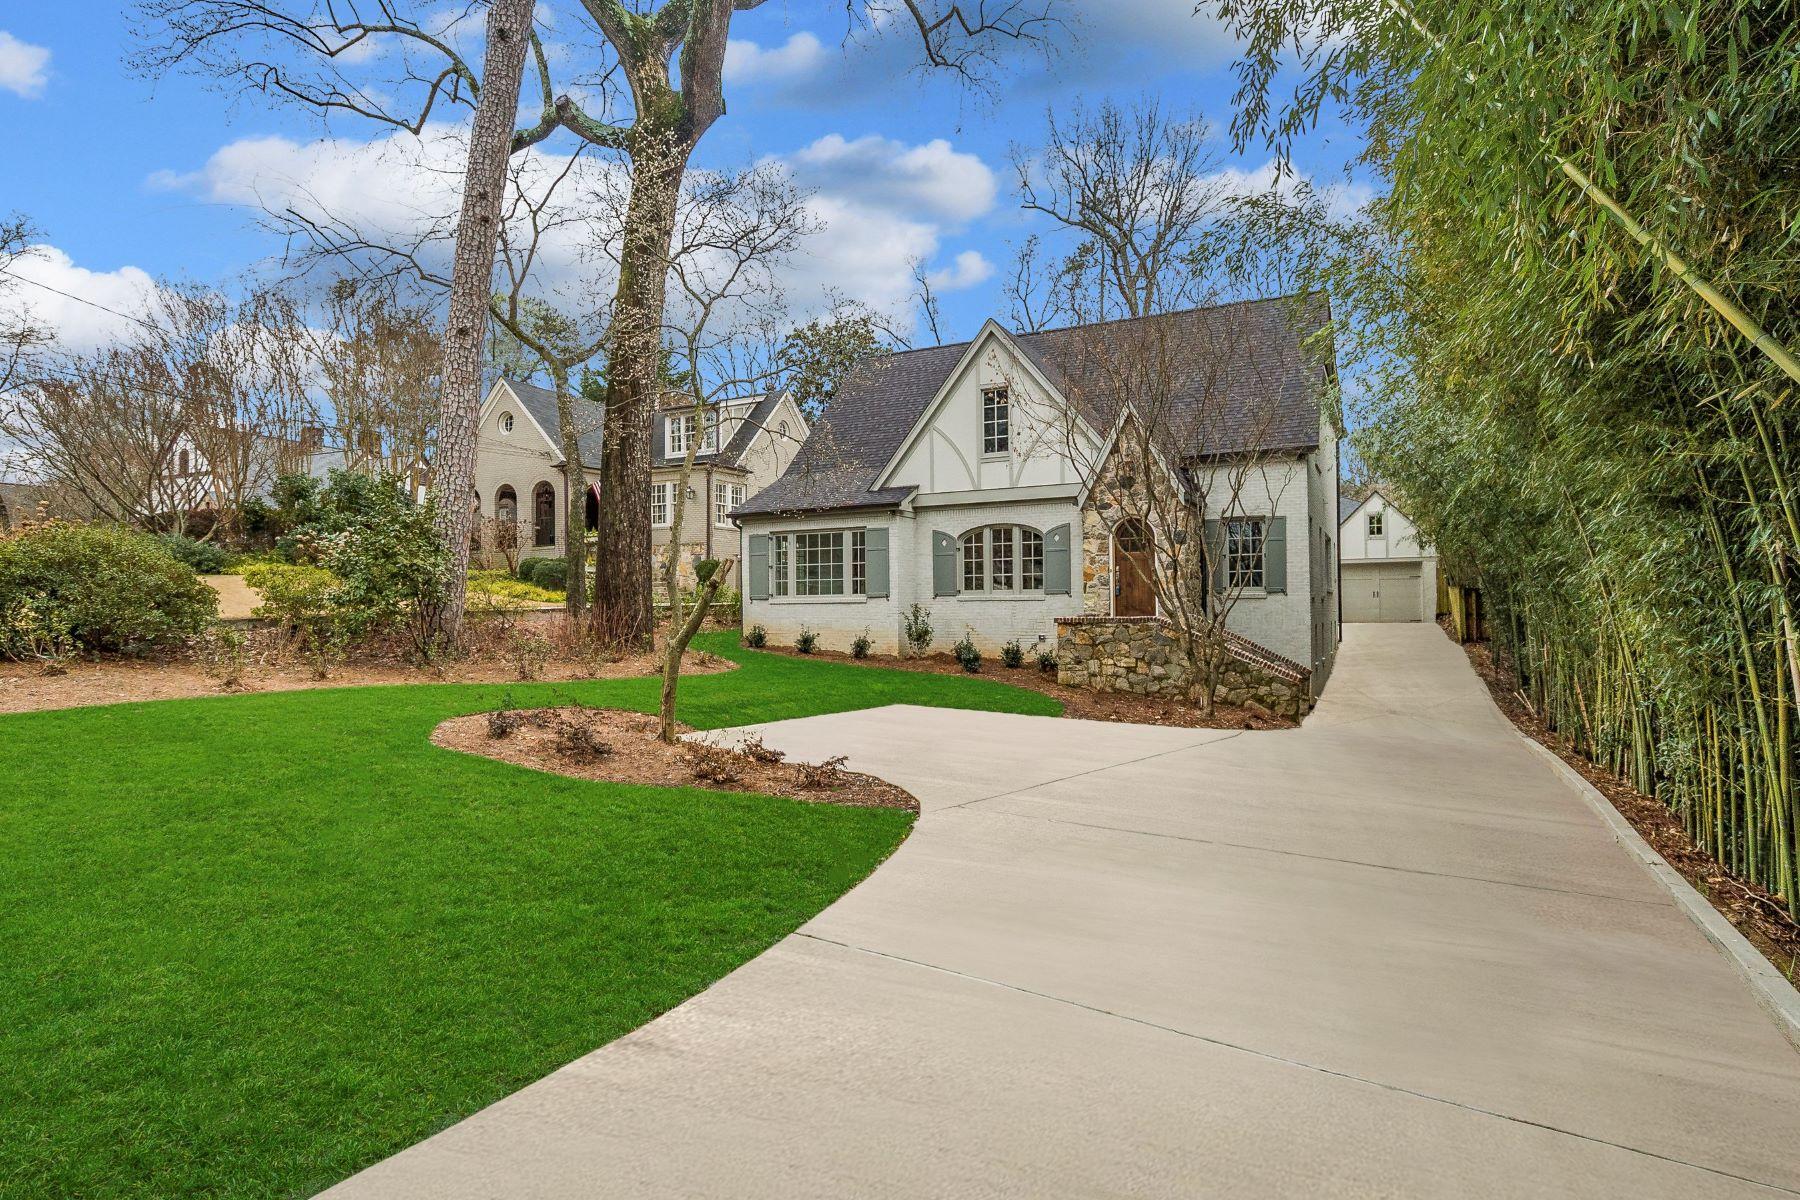 Single Family Home for Sale at Total Renovation Of A Classic Morningside Tudor 893 East Rock Springs Rd Atlanta, Georgia 30306 United States